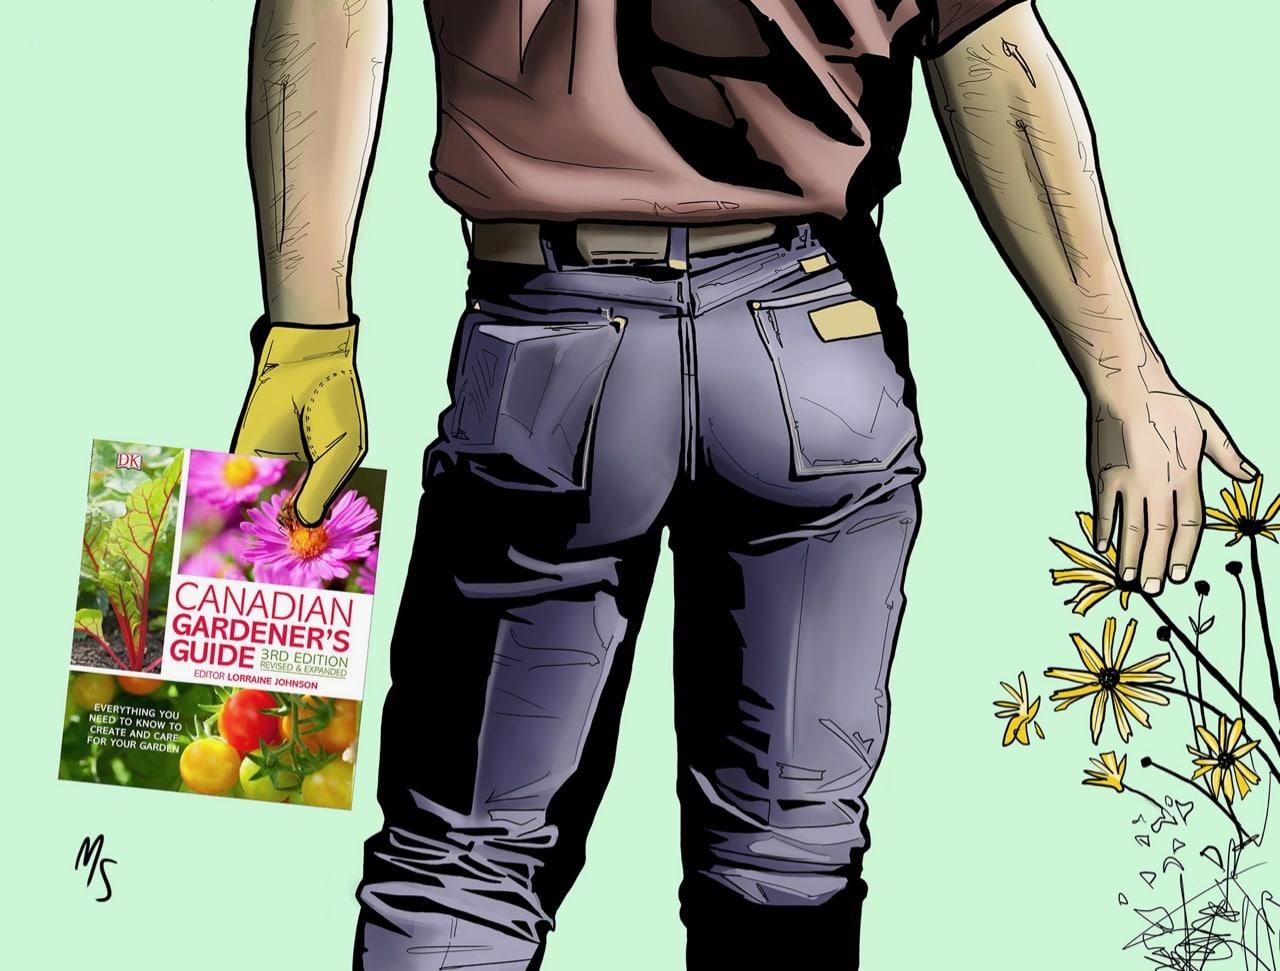 Canadian Gardener's Guide by DK Publishing.